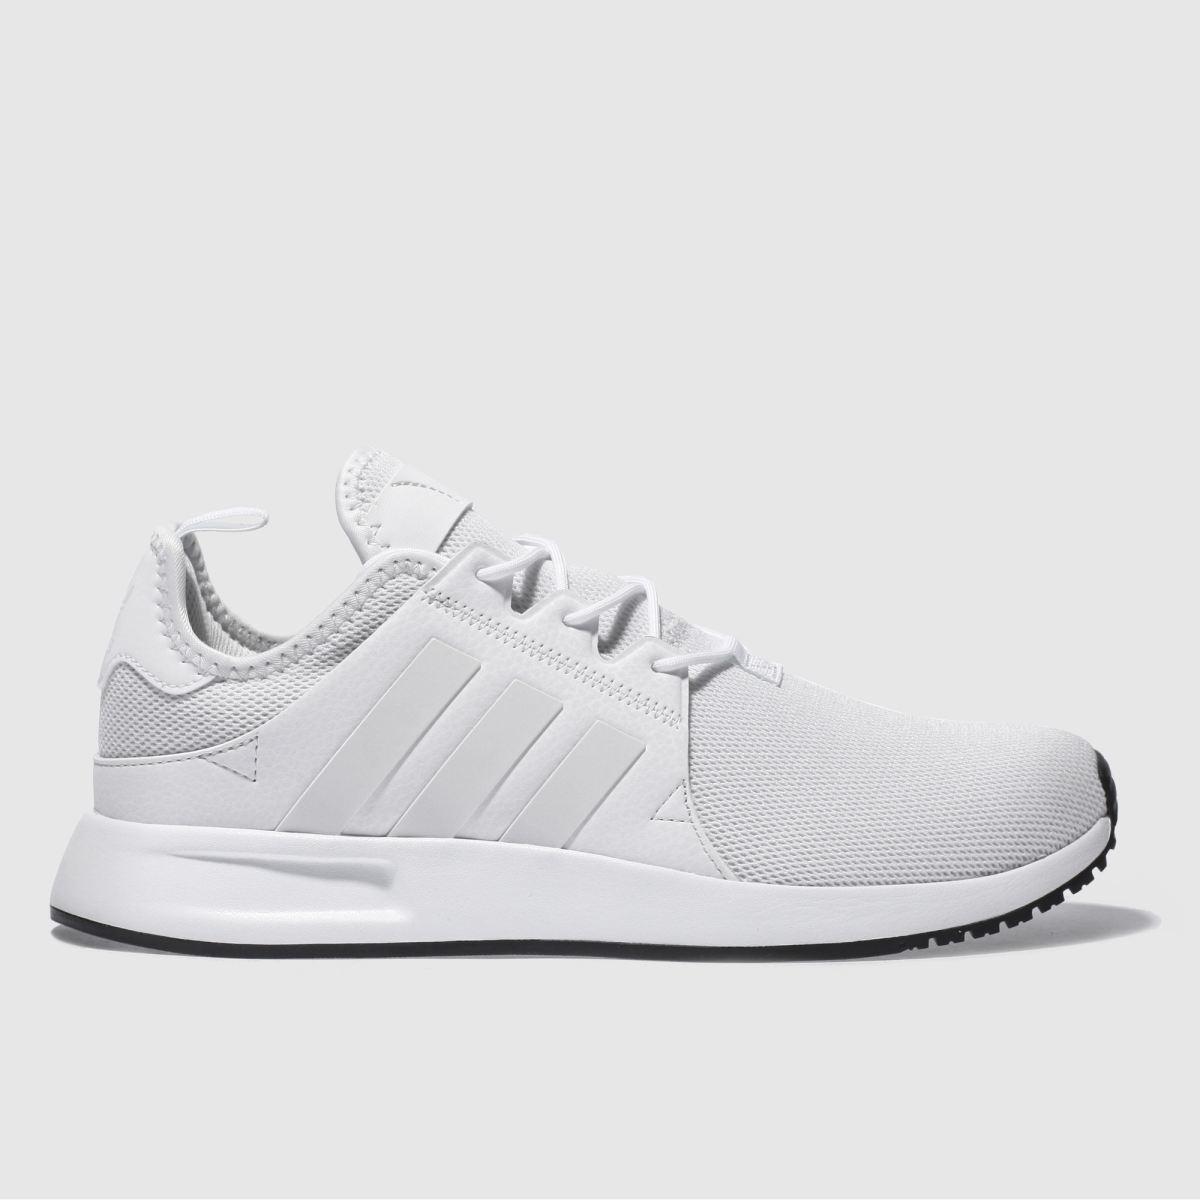 adidas white x_plr trainers